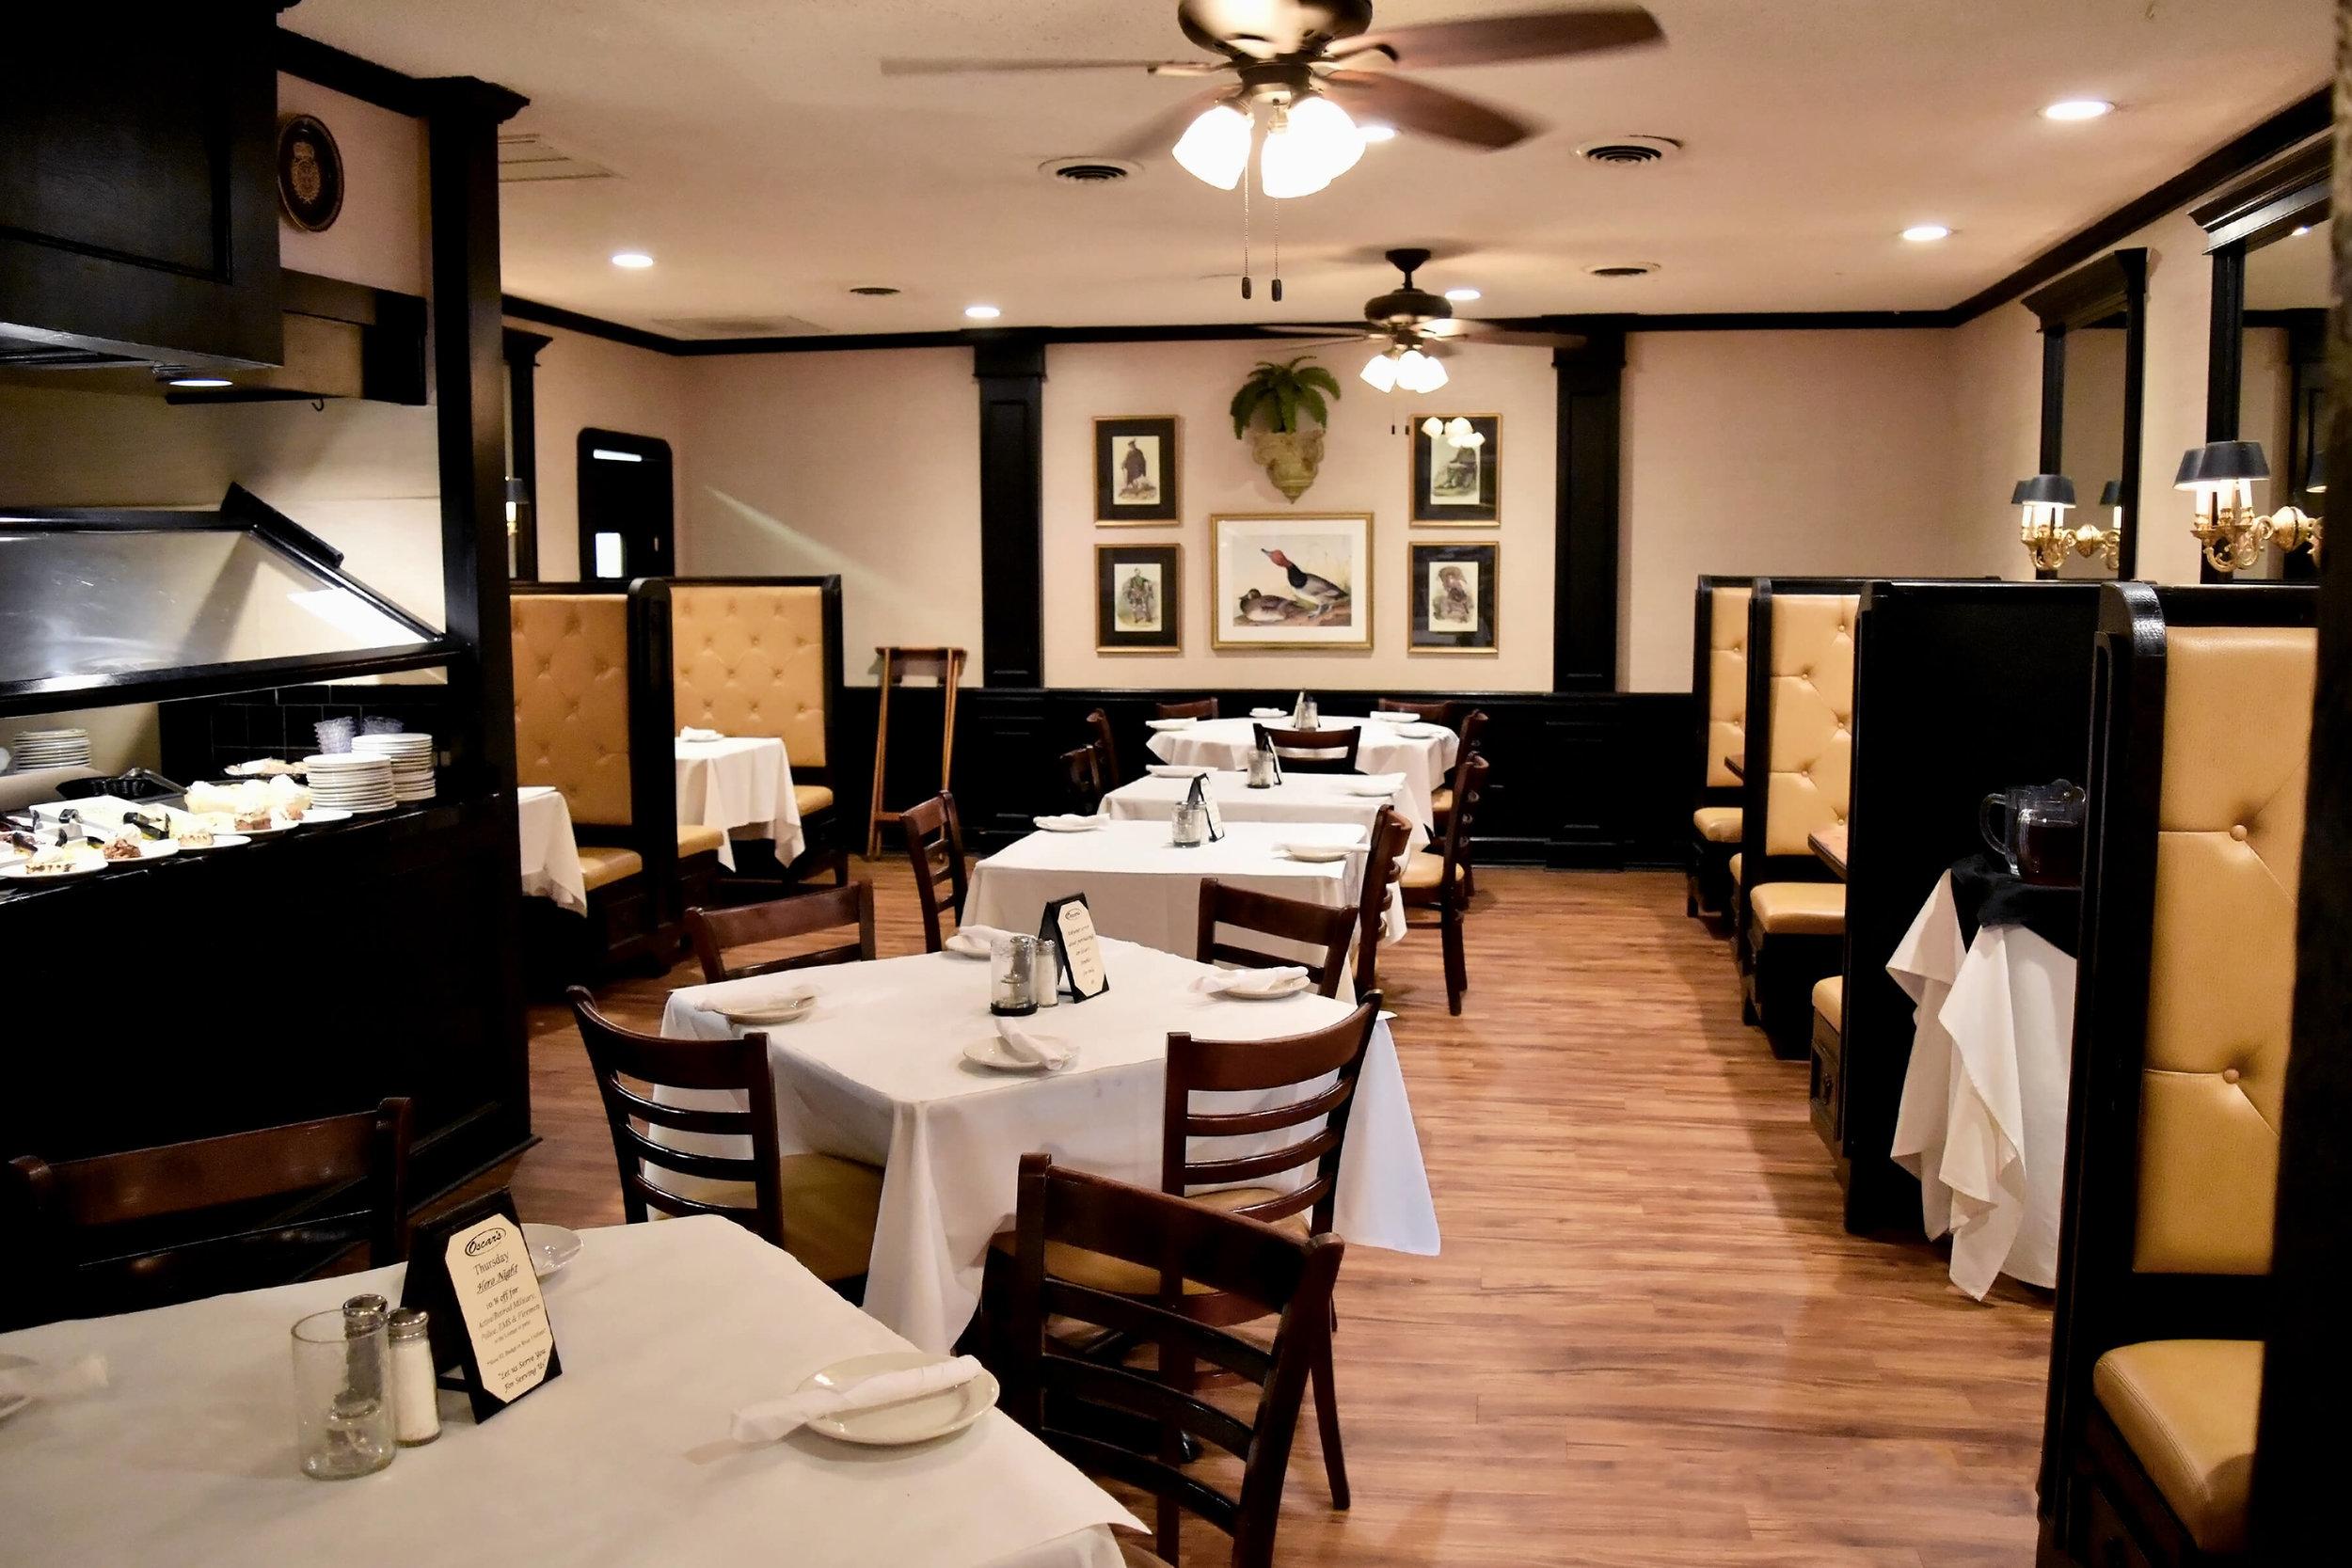 Main Dining Room with Buffet.jpg